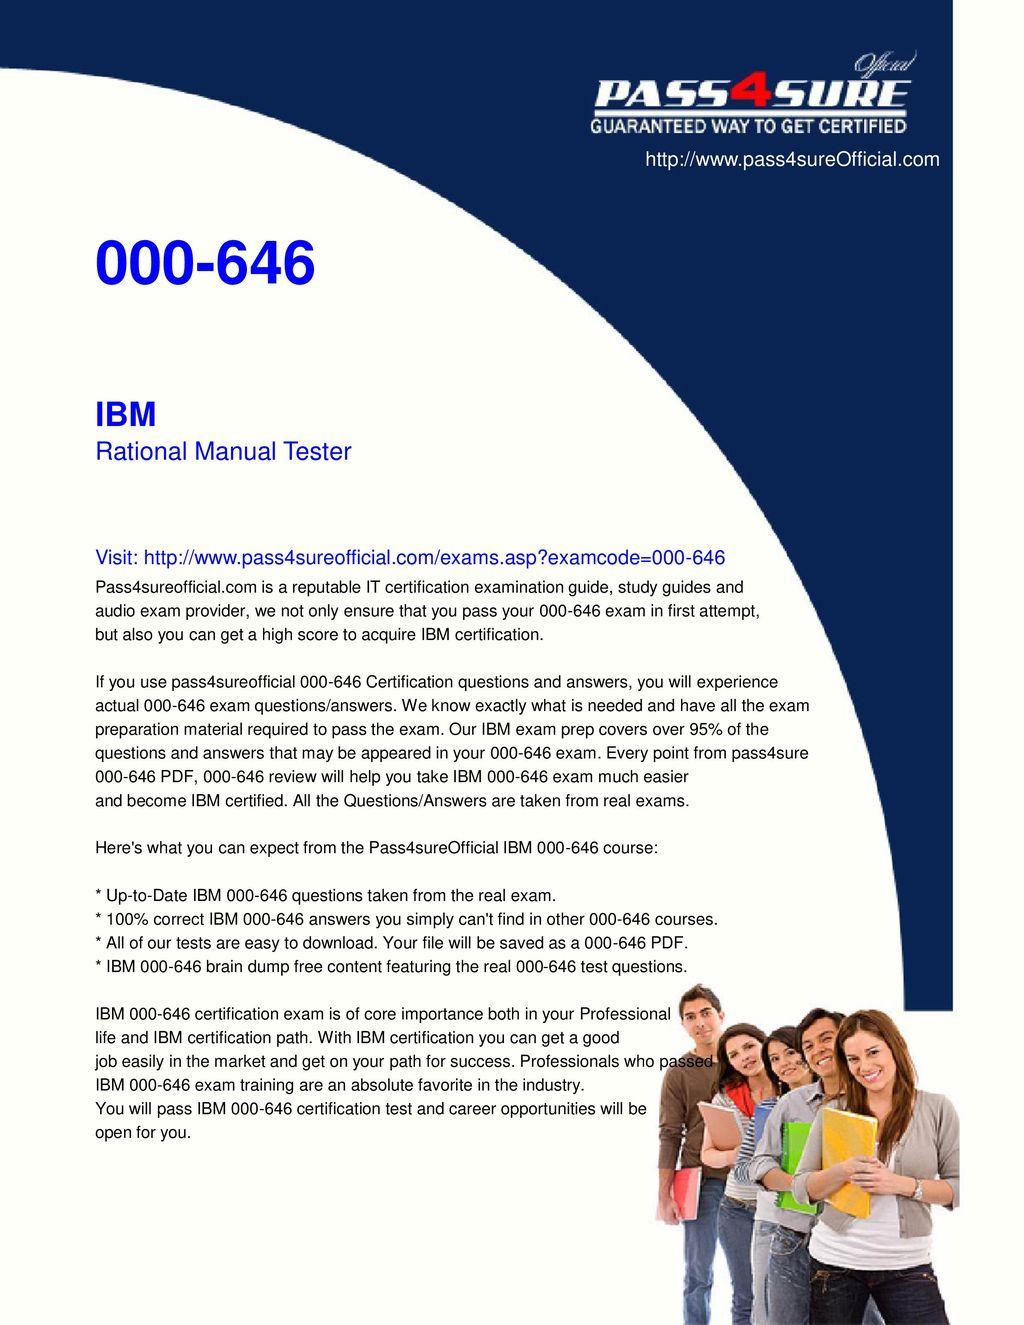 IBM Rational Manual Tester